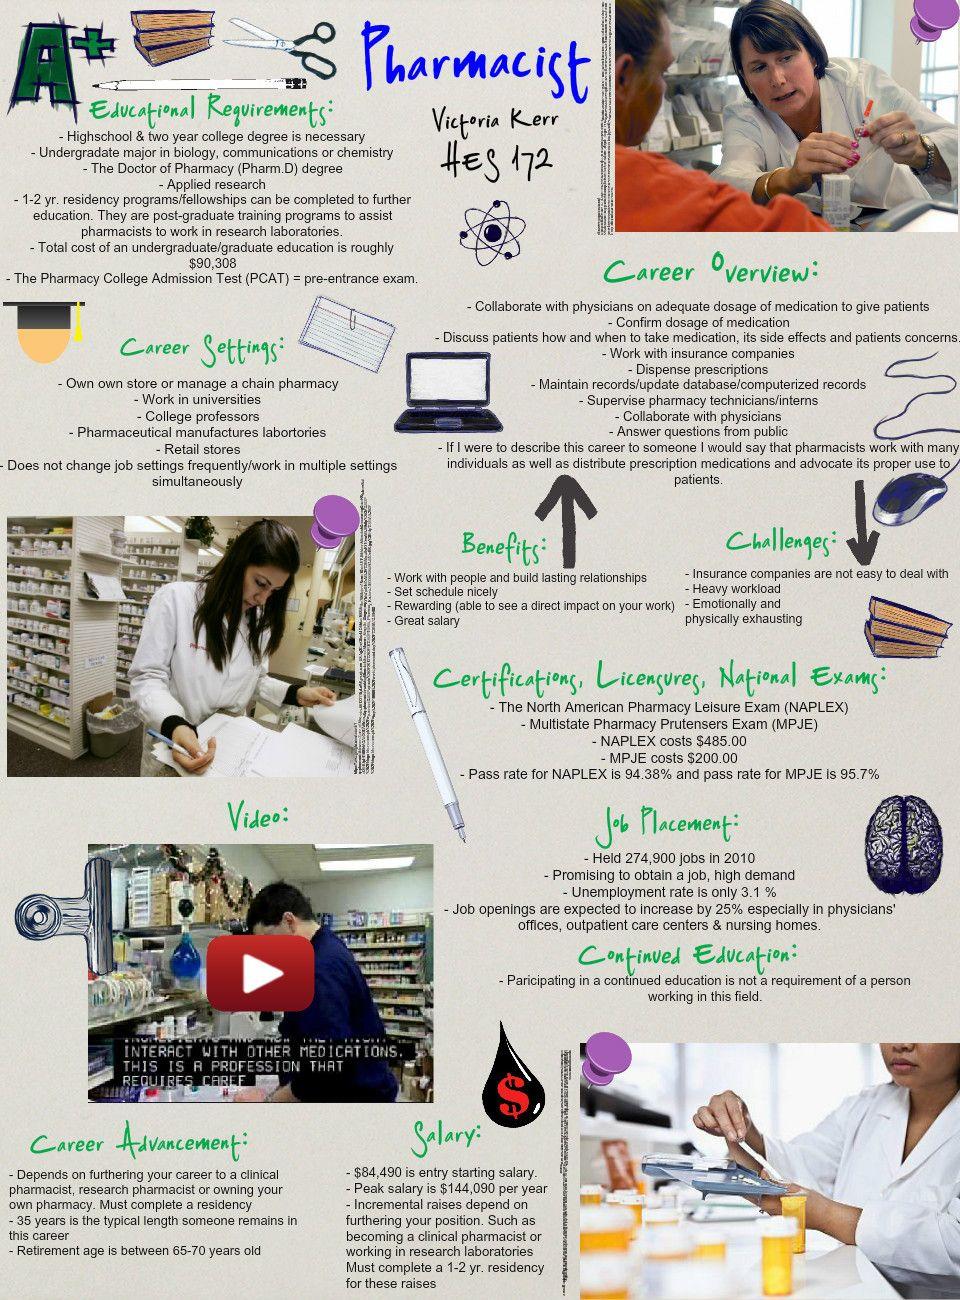 Pharmacist Career Looking for the best Pharmacist resume